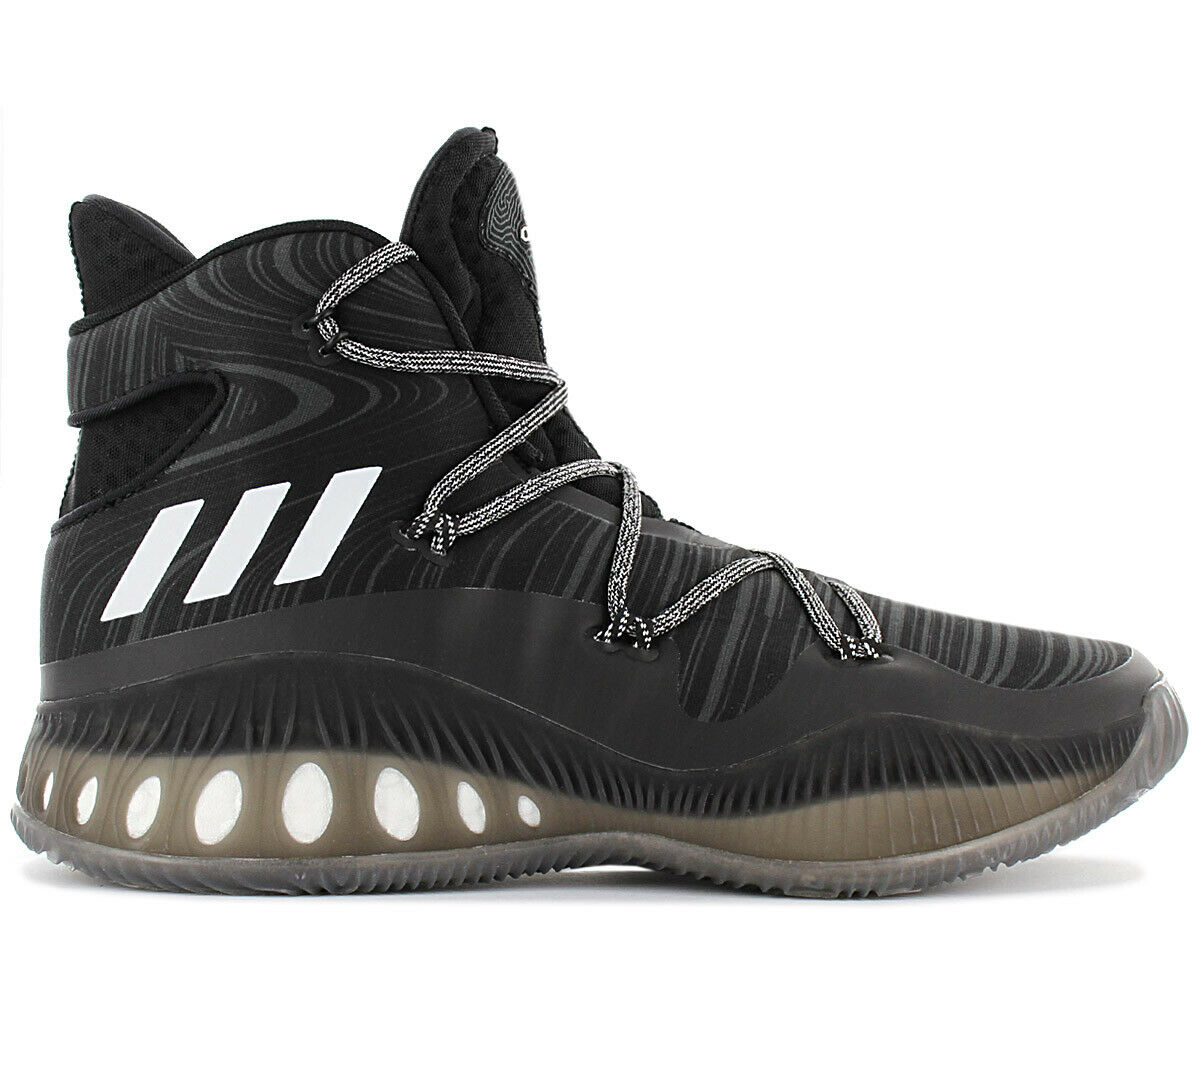 Adidas Crazy Explosive Boost Herren Basketballschuhe B42421 Sportschuhe Schwarz